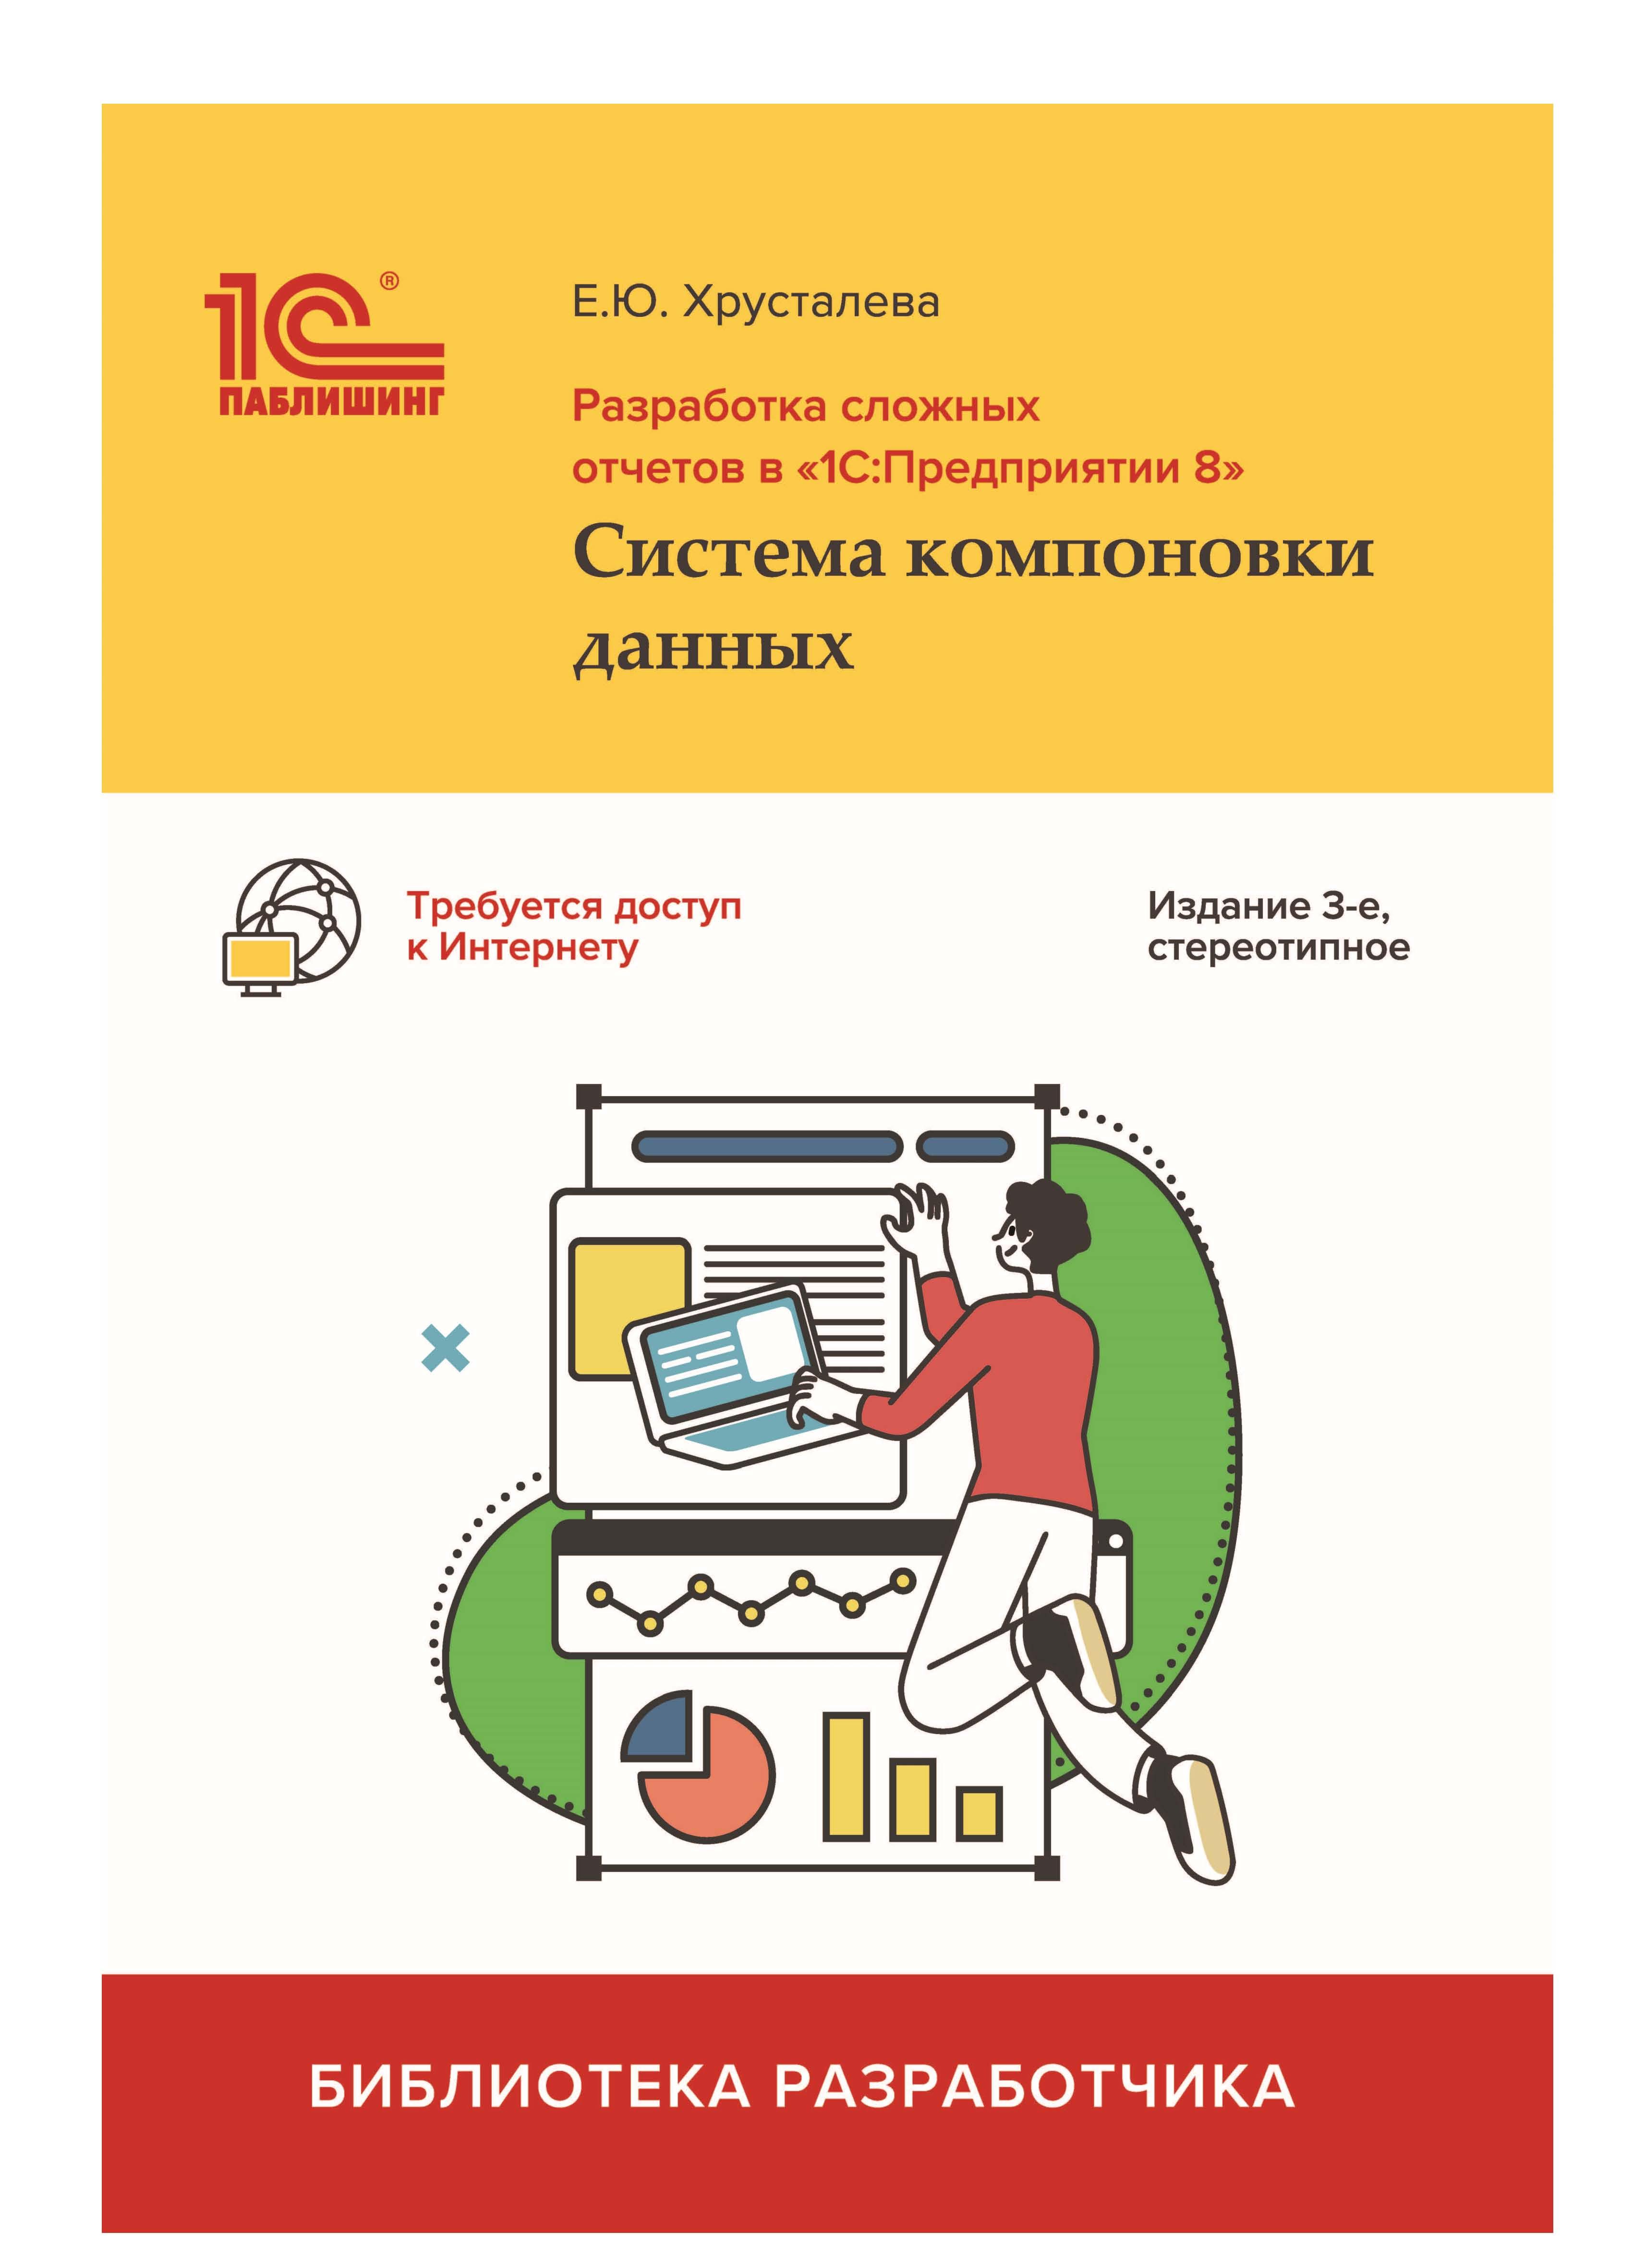 Разработка сложных отчетов в «1С:Предприятии 8». Система компоновки данных (+epub)